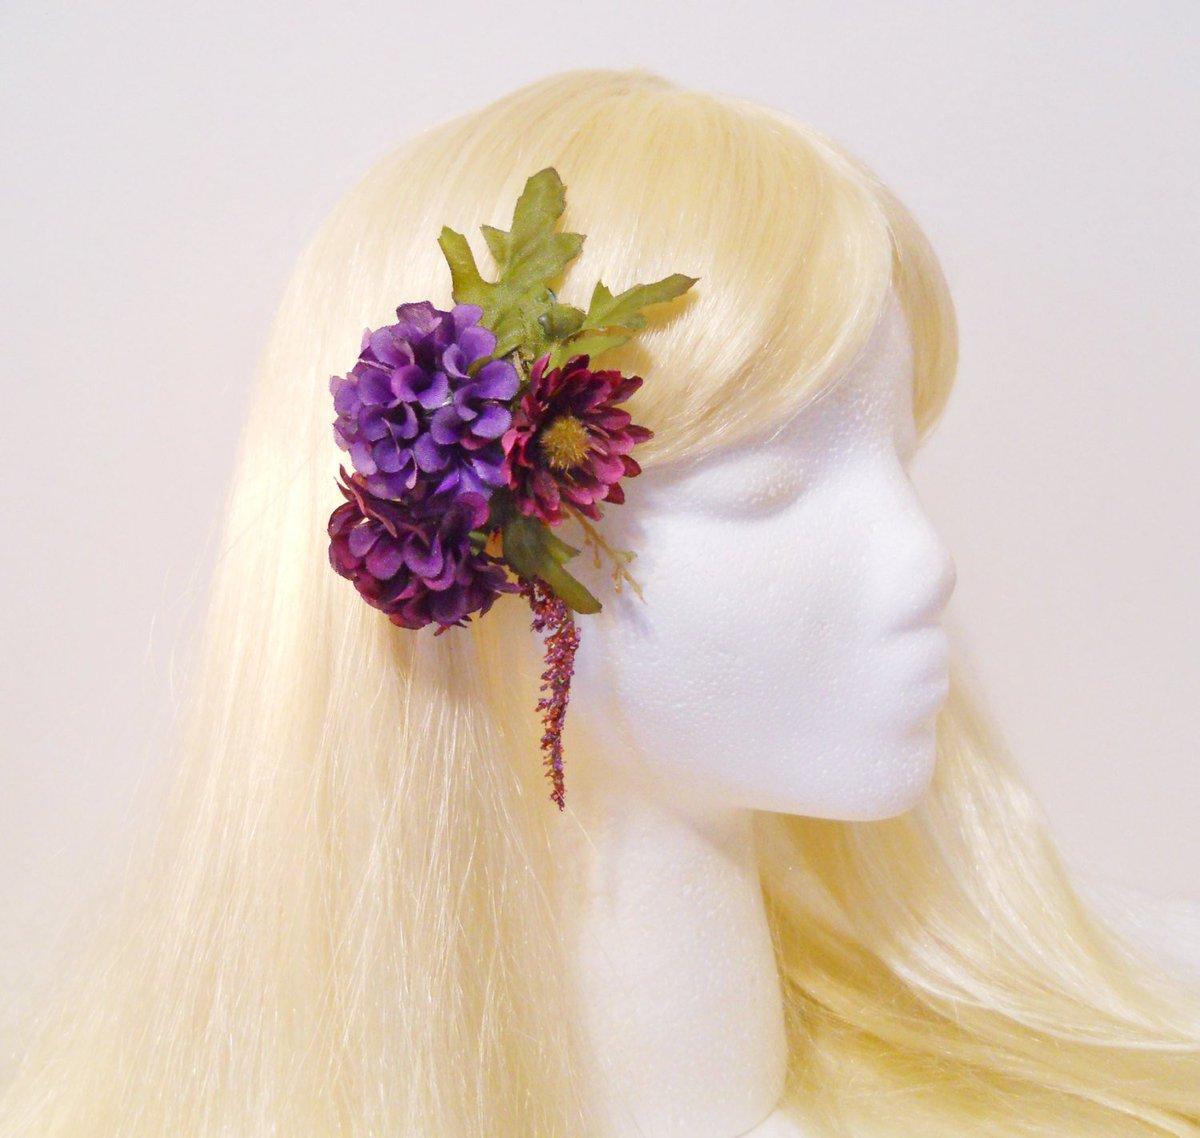 Purple Daisy Hair Clip Purple Flower Burgundy Mum Flower Purple Bar…  http:// tuppu.net/72fc266f  &nbsp;   #Bride #HeatherHairClip<br>http://pic.twitter.com/Oj5ACLoff0